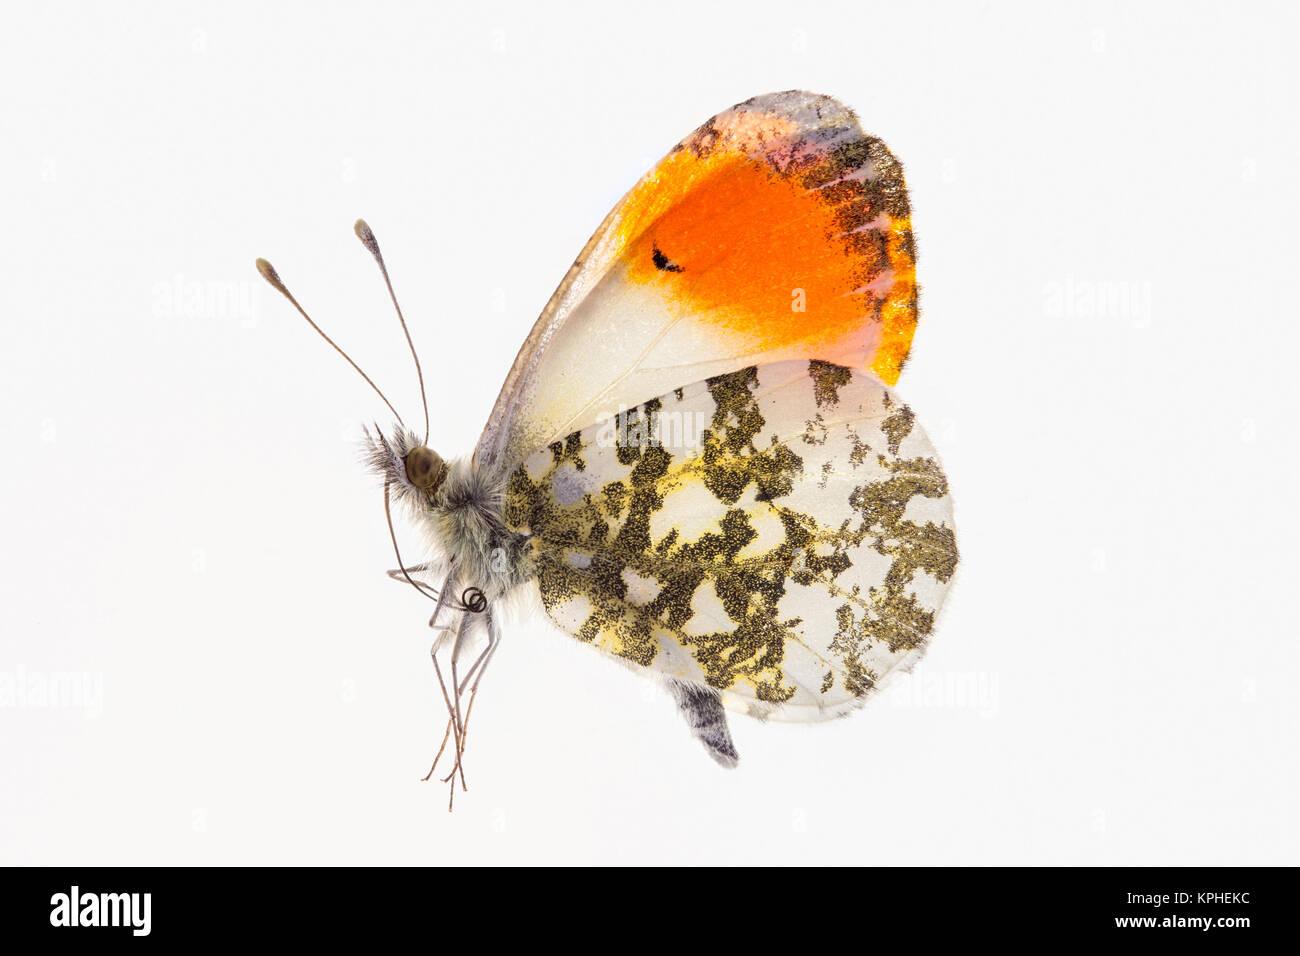 Male Orange Tip Butterfly  Dead specimen on a backlit white background - Stock Image